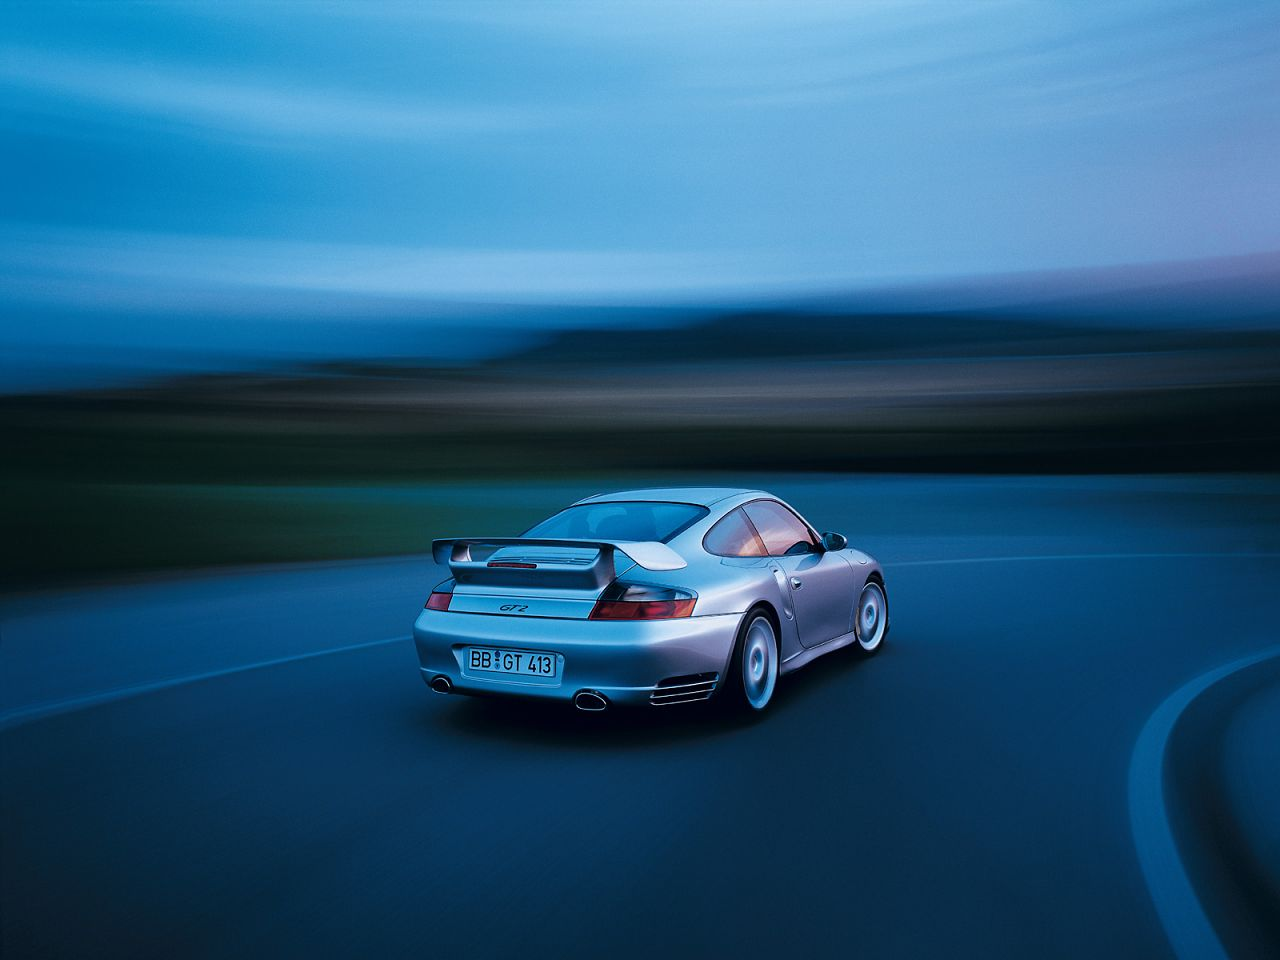 2005 Porsche 911 GT2 Picture